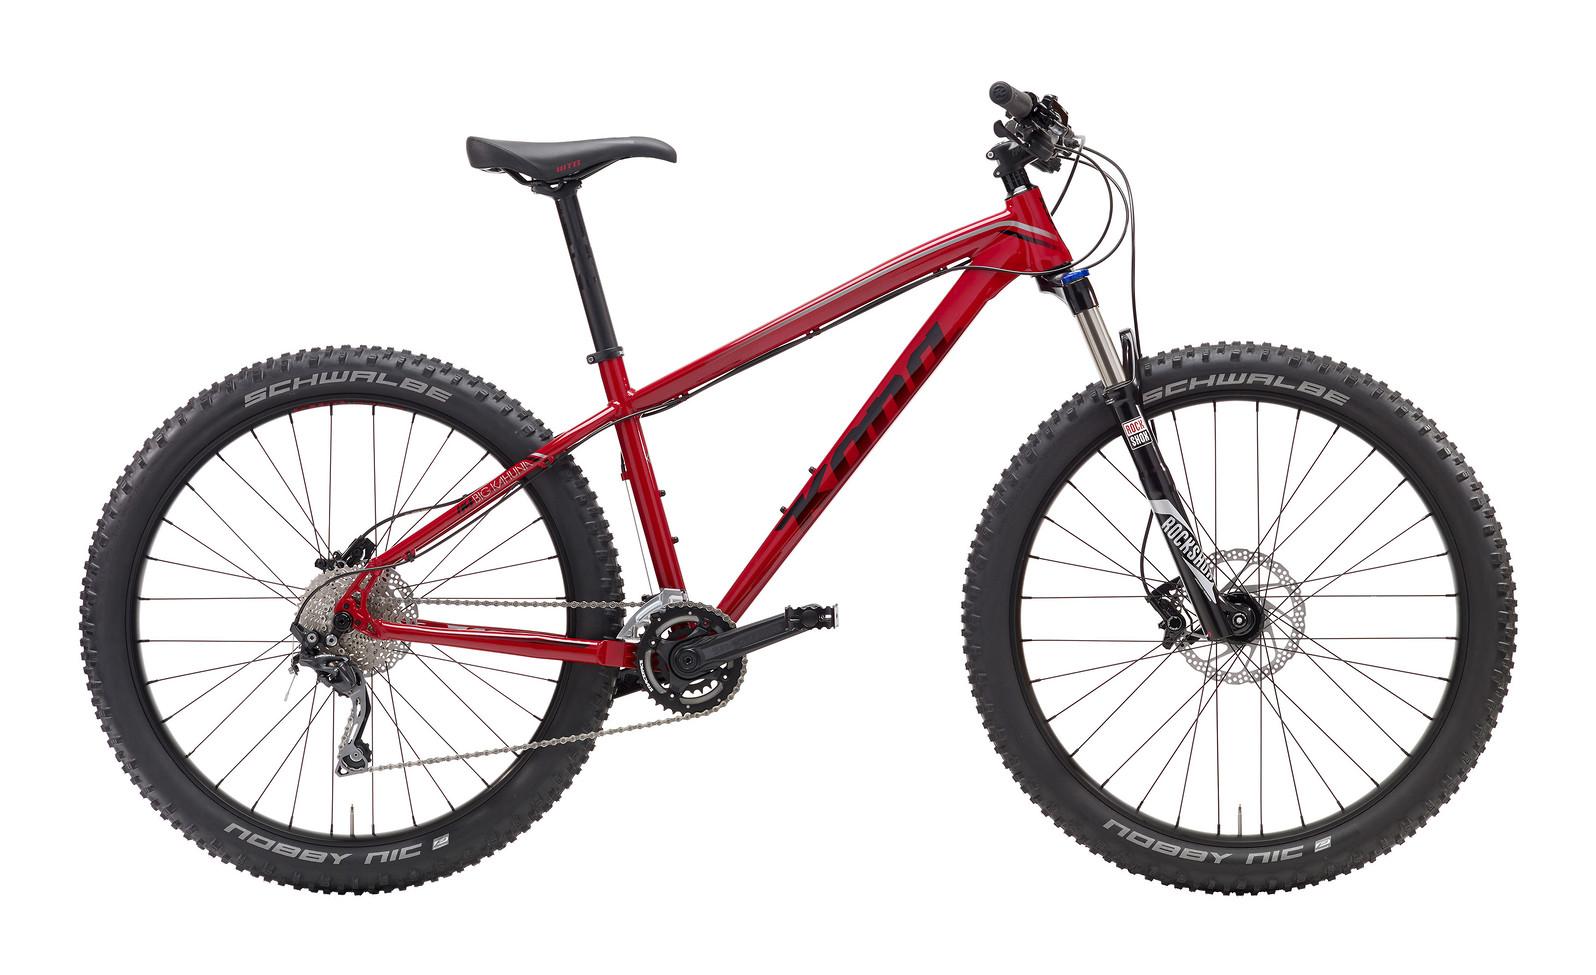 2deb5f5e7c9 2017 Kona Big Kahuna Bike - Reviews, Comparisons, Specs - Mountain ...